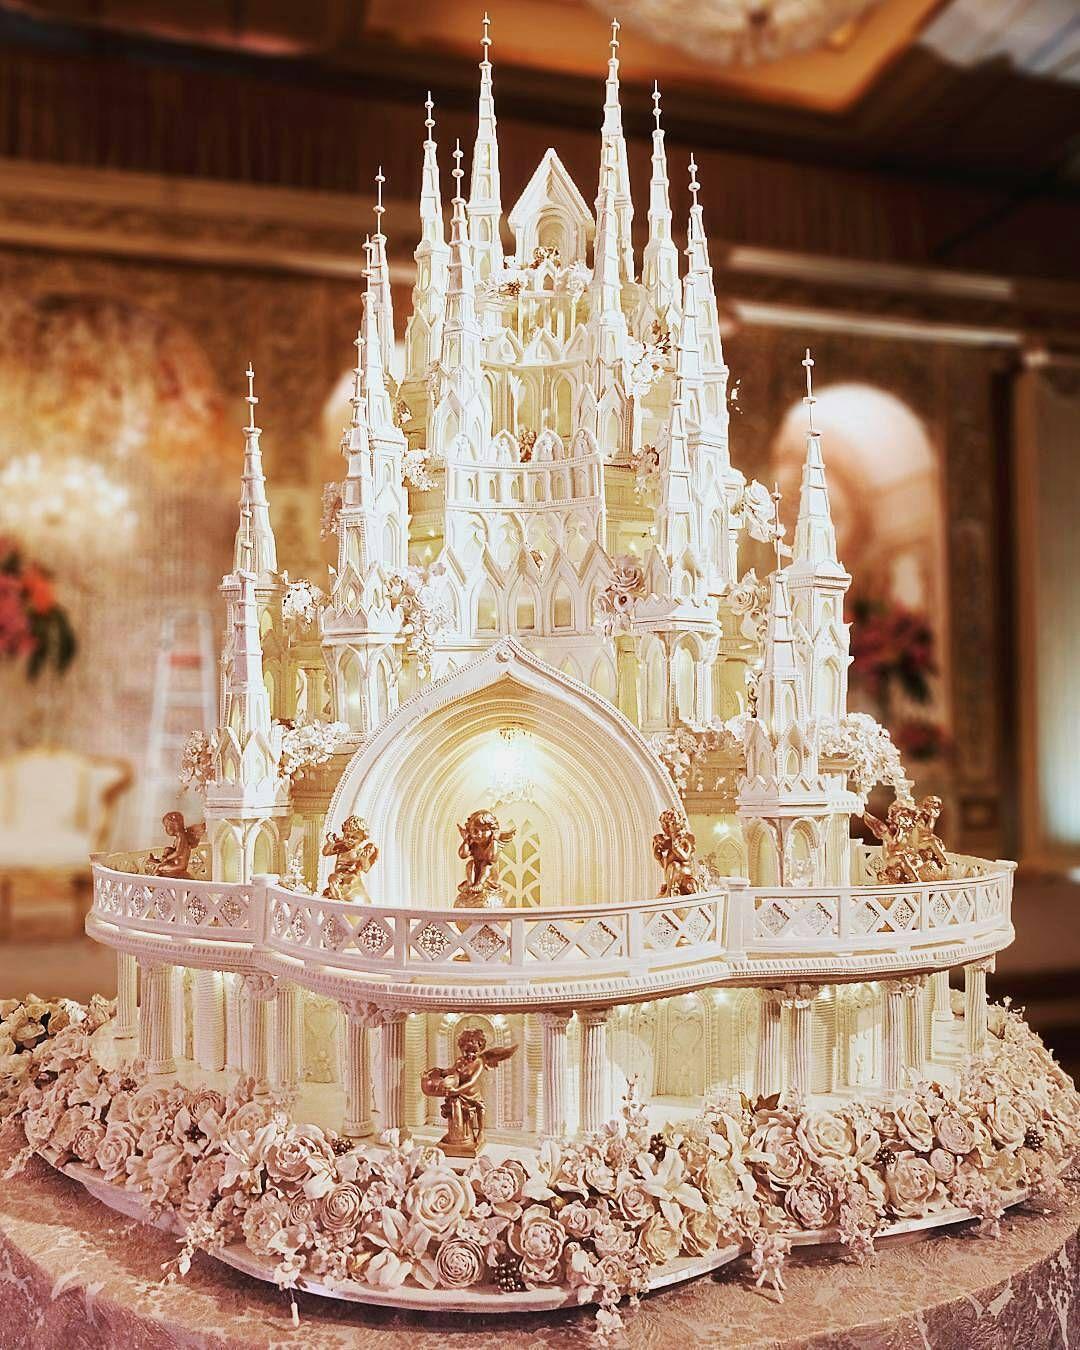 Pin by Darlene Hedrick on Huge wedding cakes Extravagant